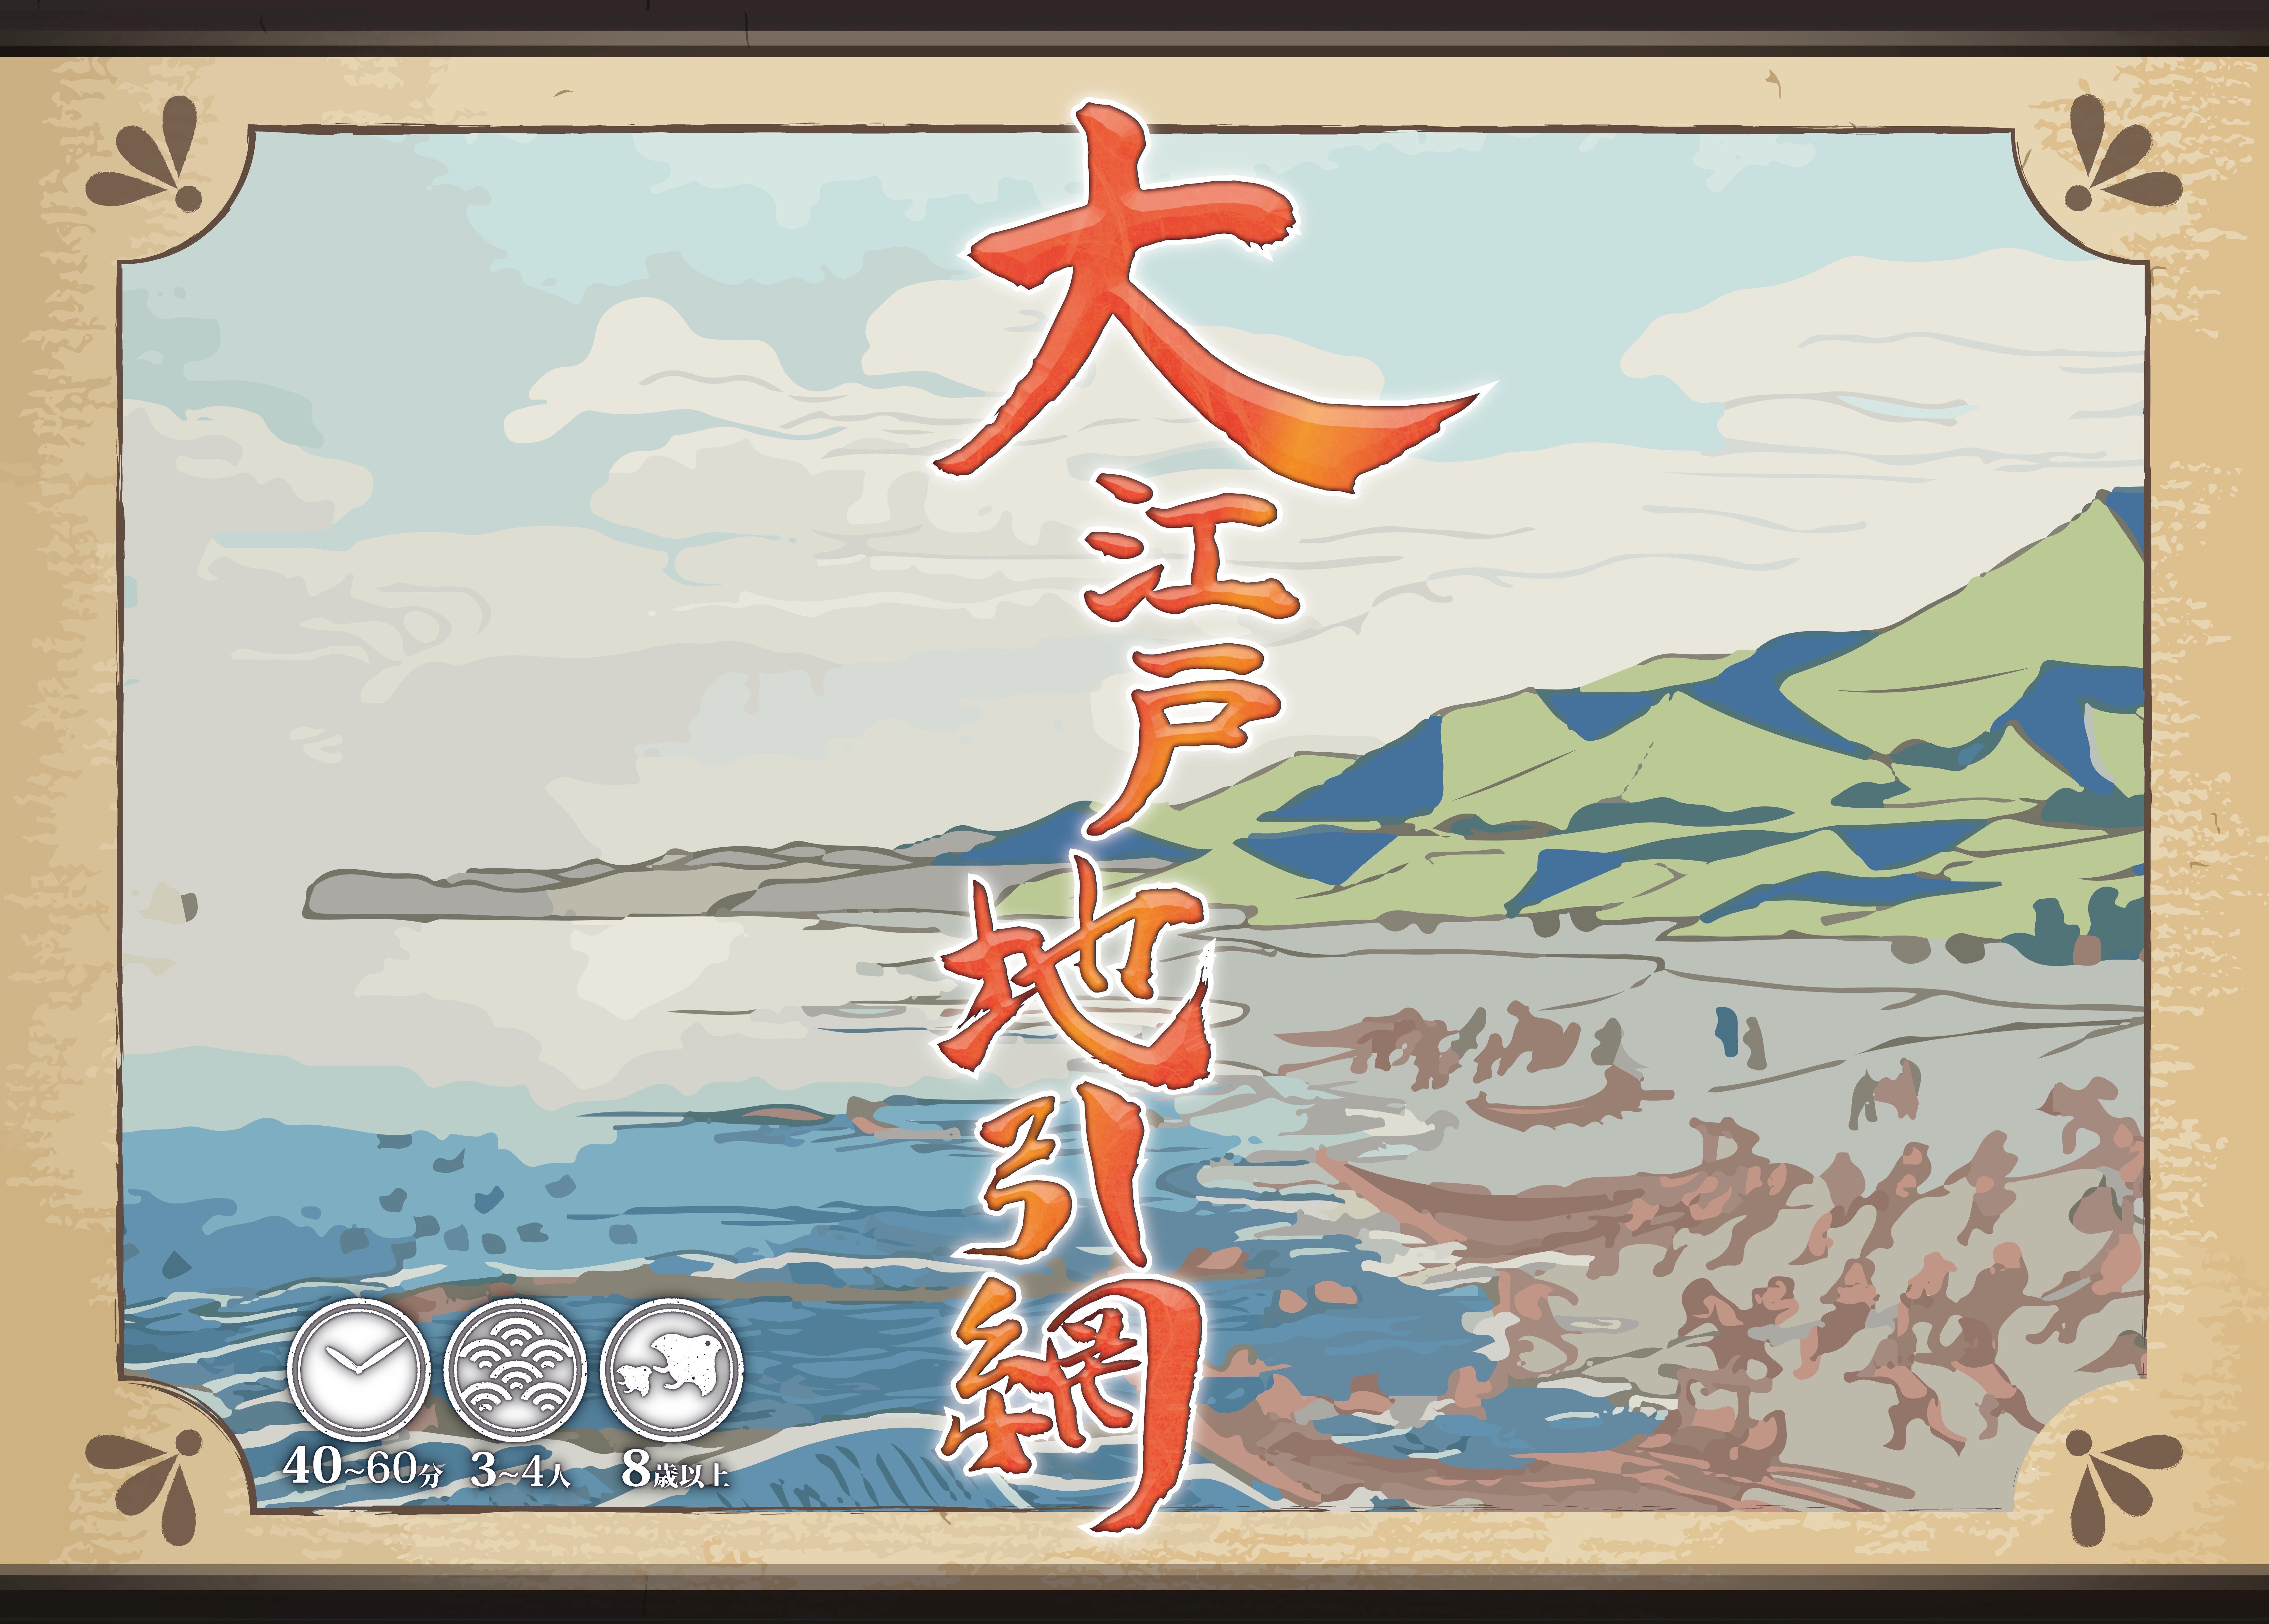 【大江戸地引網】ルール紹介動画を公開!